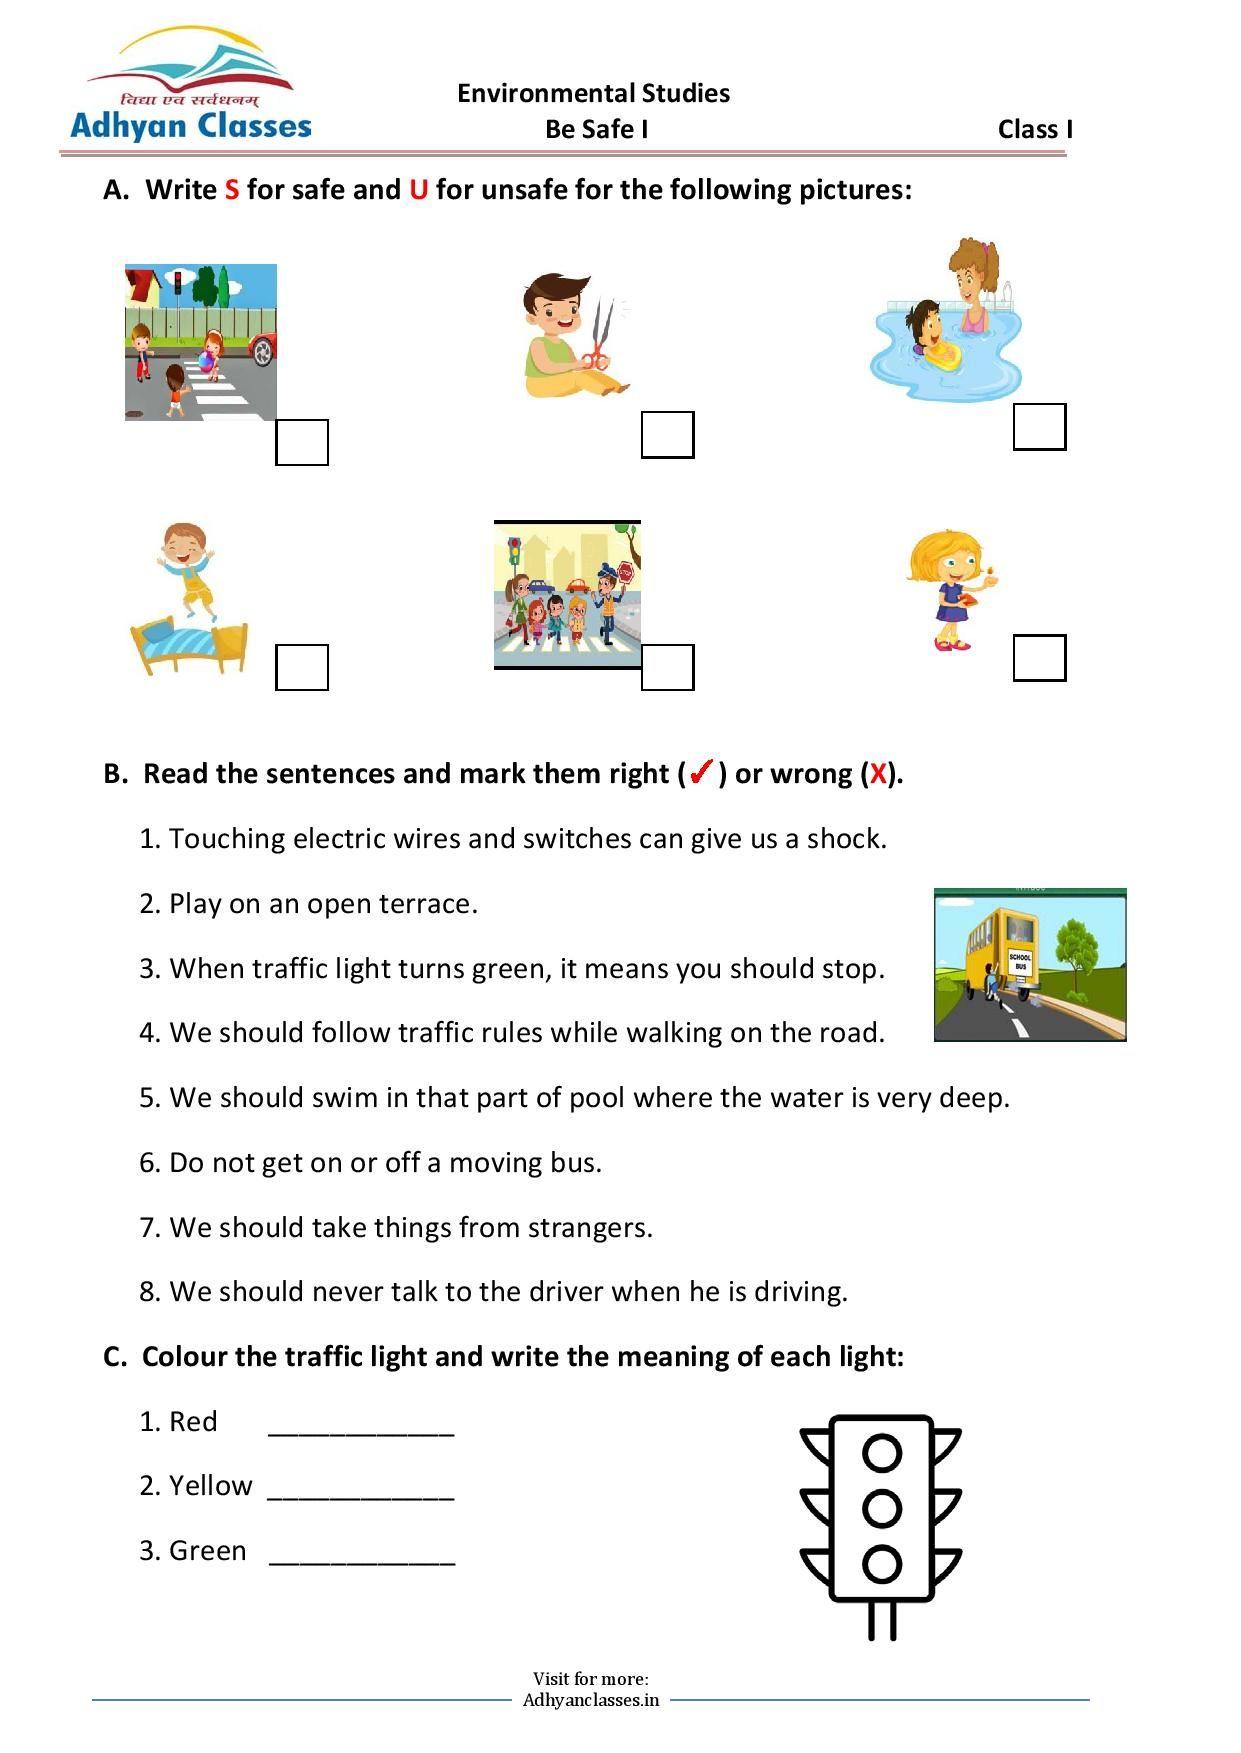 Be Safe Worksheet for Grade I   English writing skills [ 1753 x 1241 Pixel ]